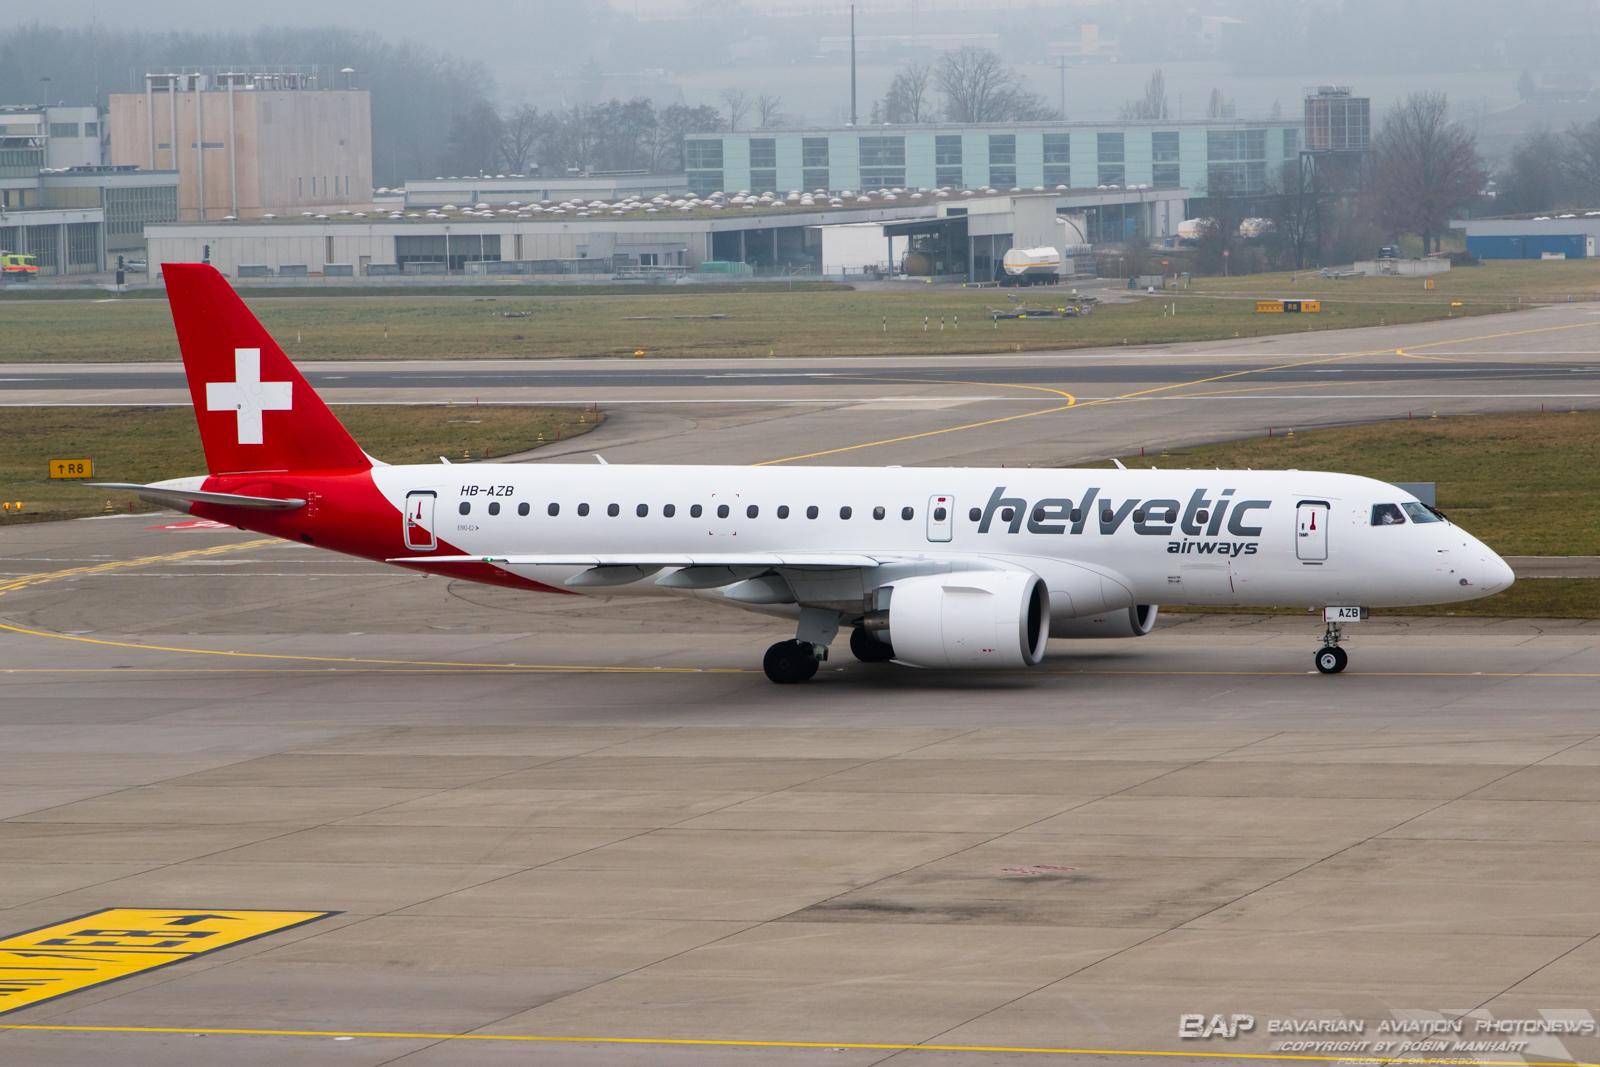 HB-AZB E290 HELVETIC AIRWAYS @ZHR